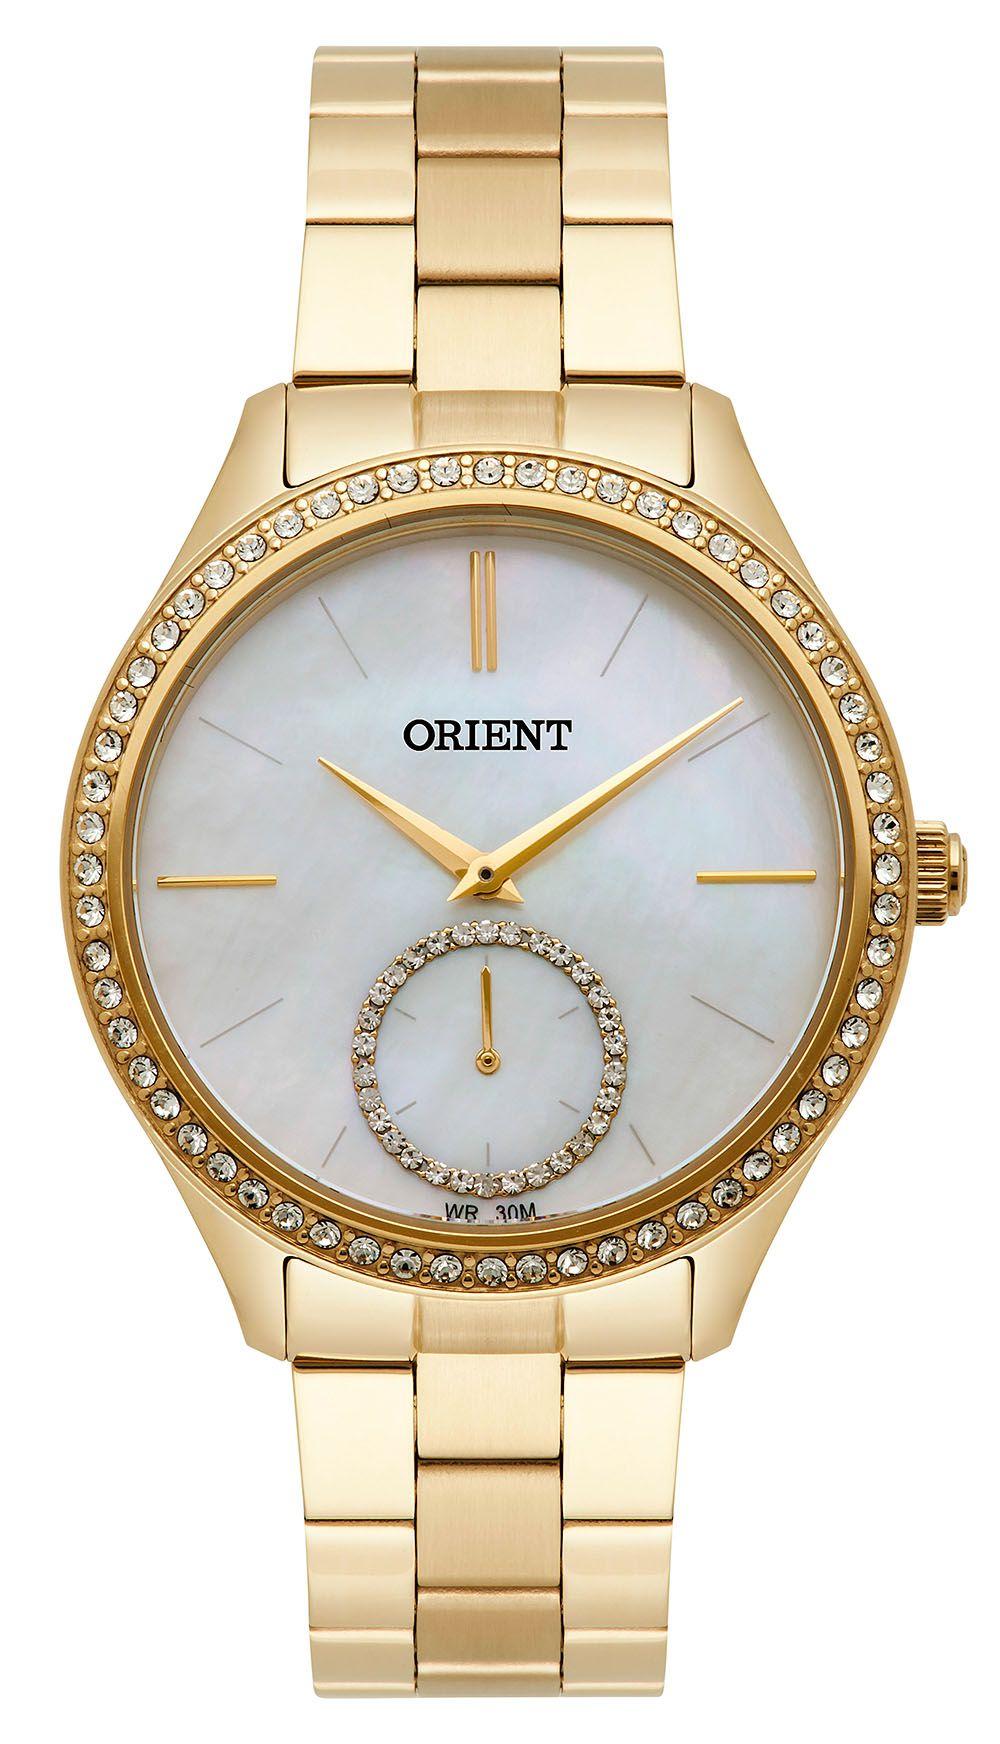 d44d99e30ab Relógio Orient Feminino FGSS0104-B1KX Dourado - PATRICIA JOIAS